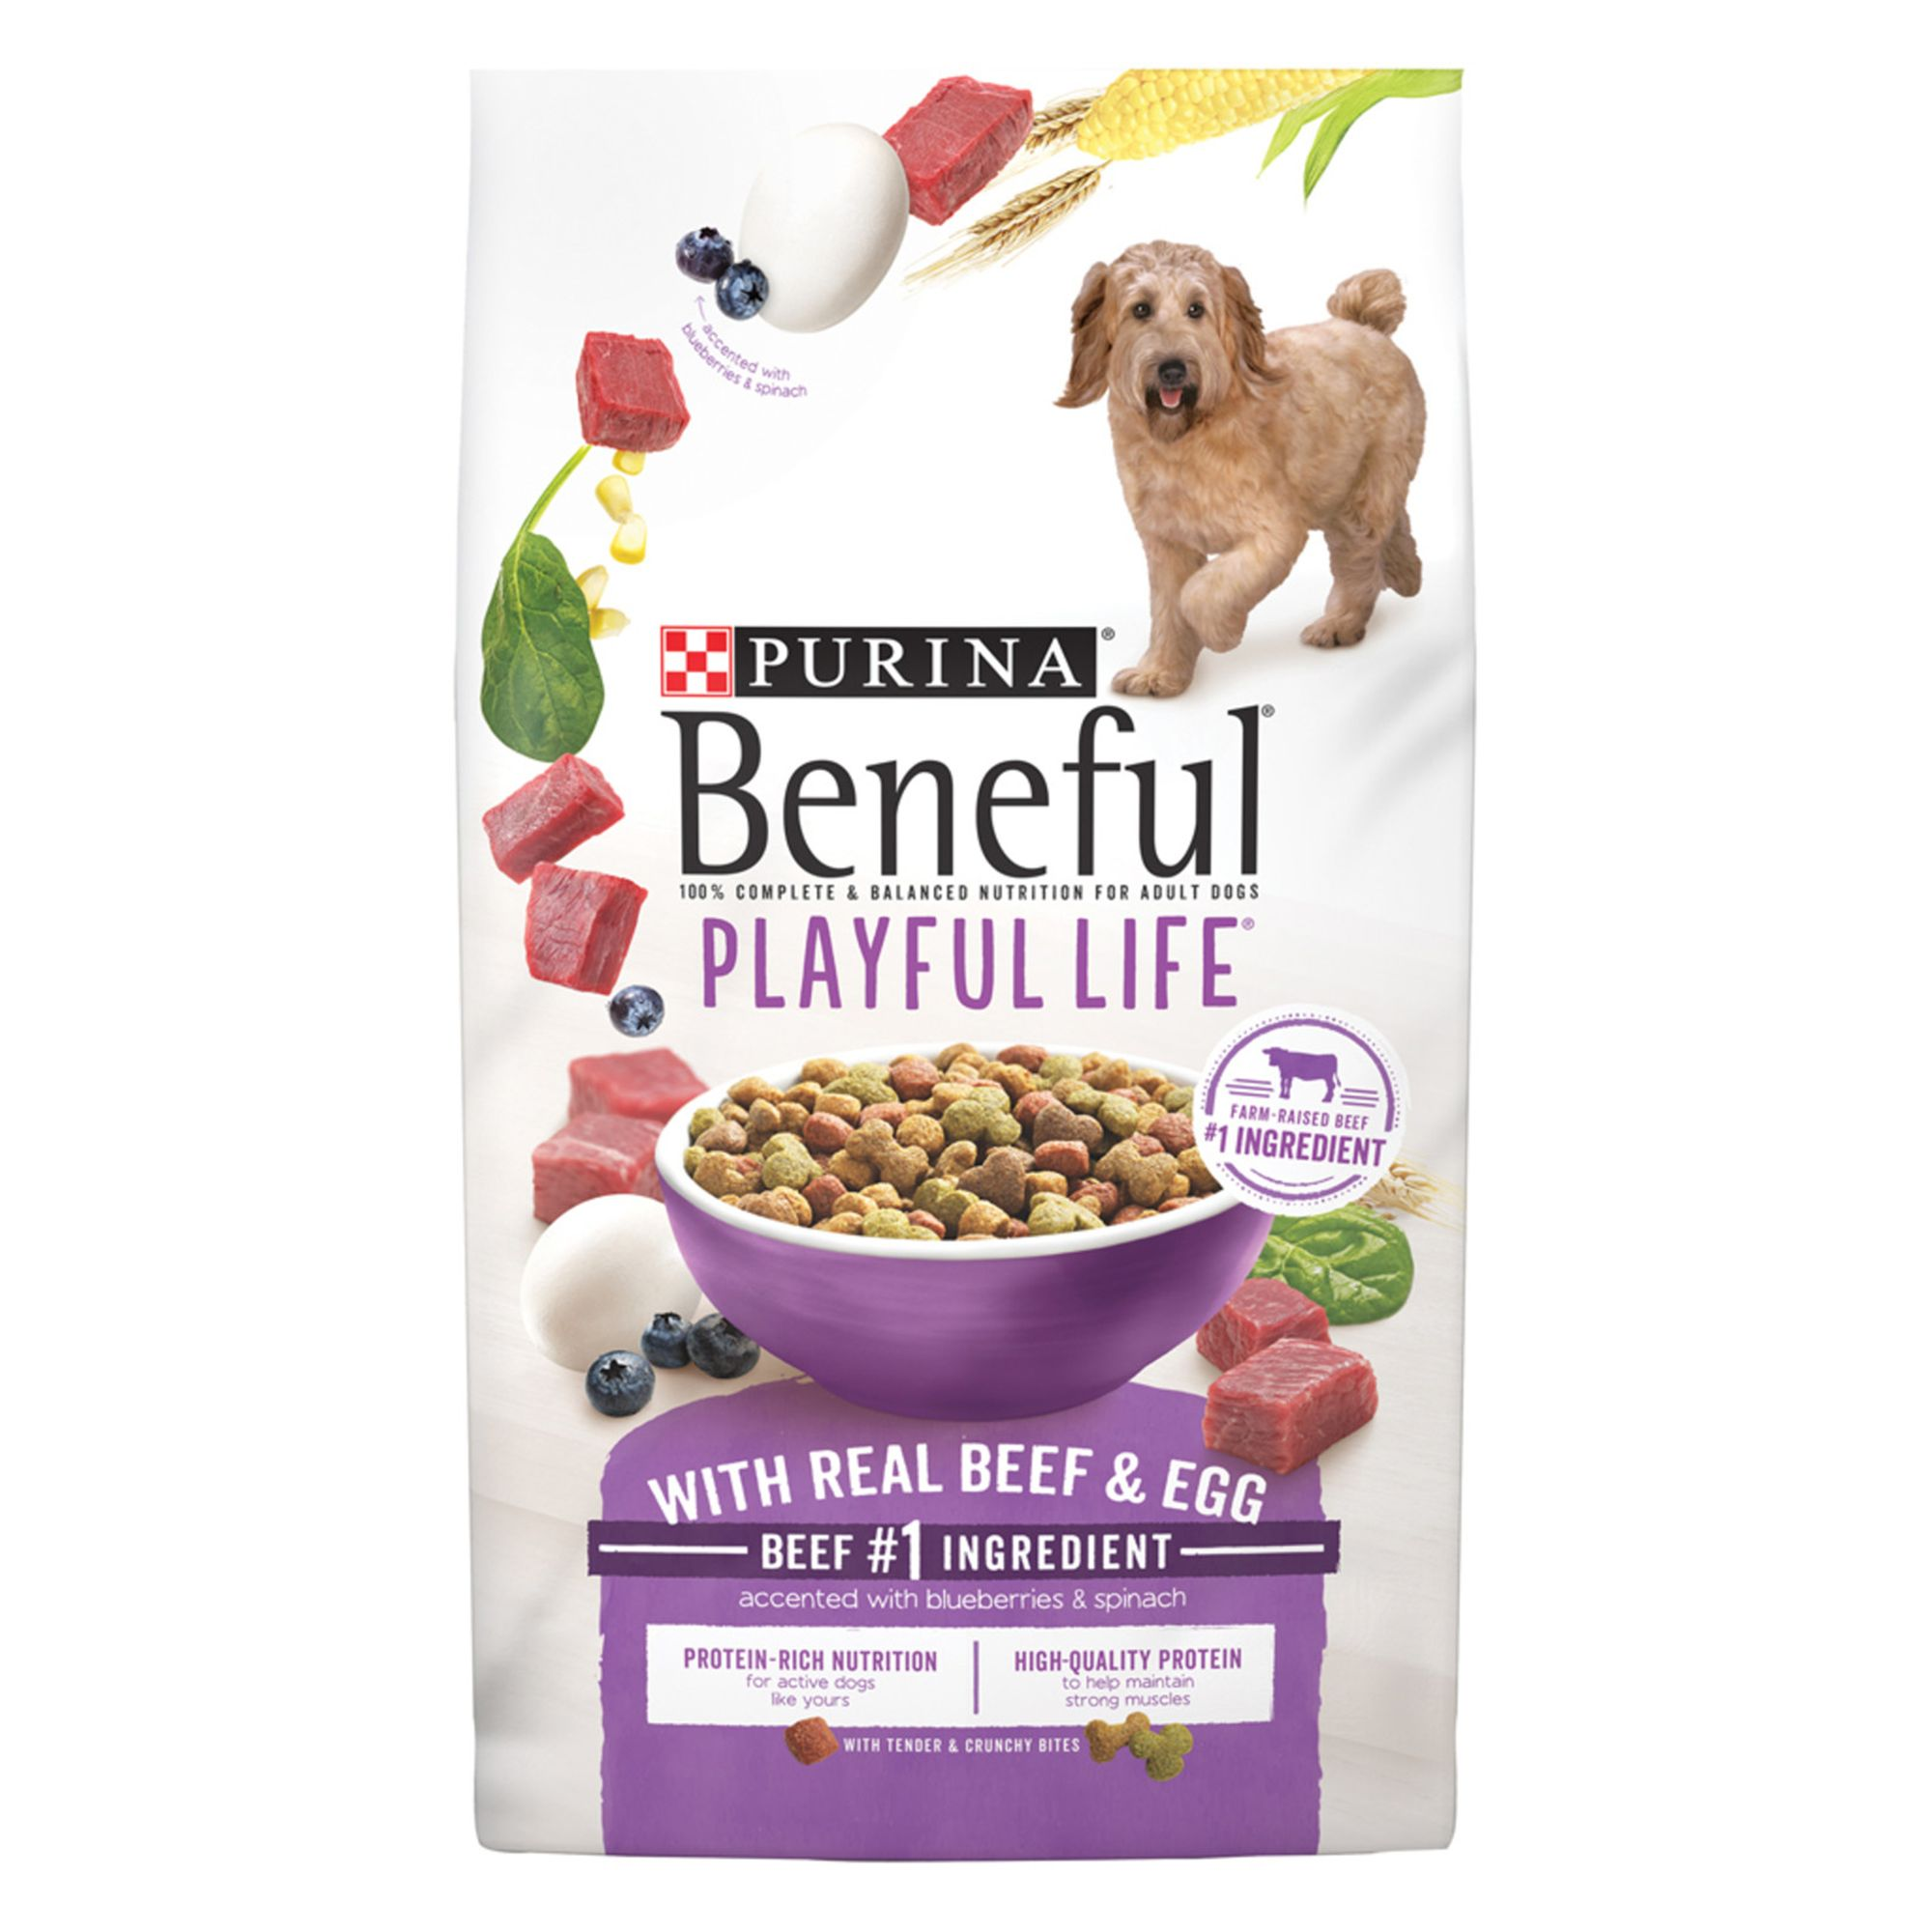 Purina® Beneful® Playful Life Adult Dog Food - Beef